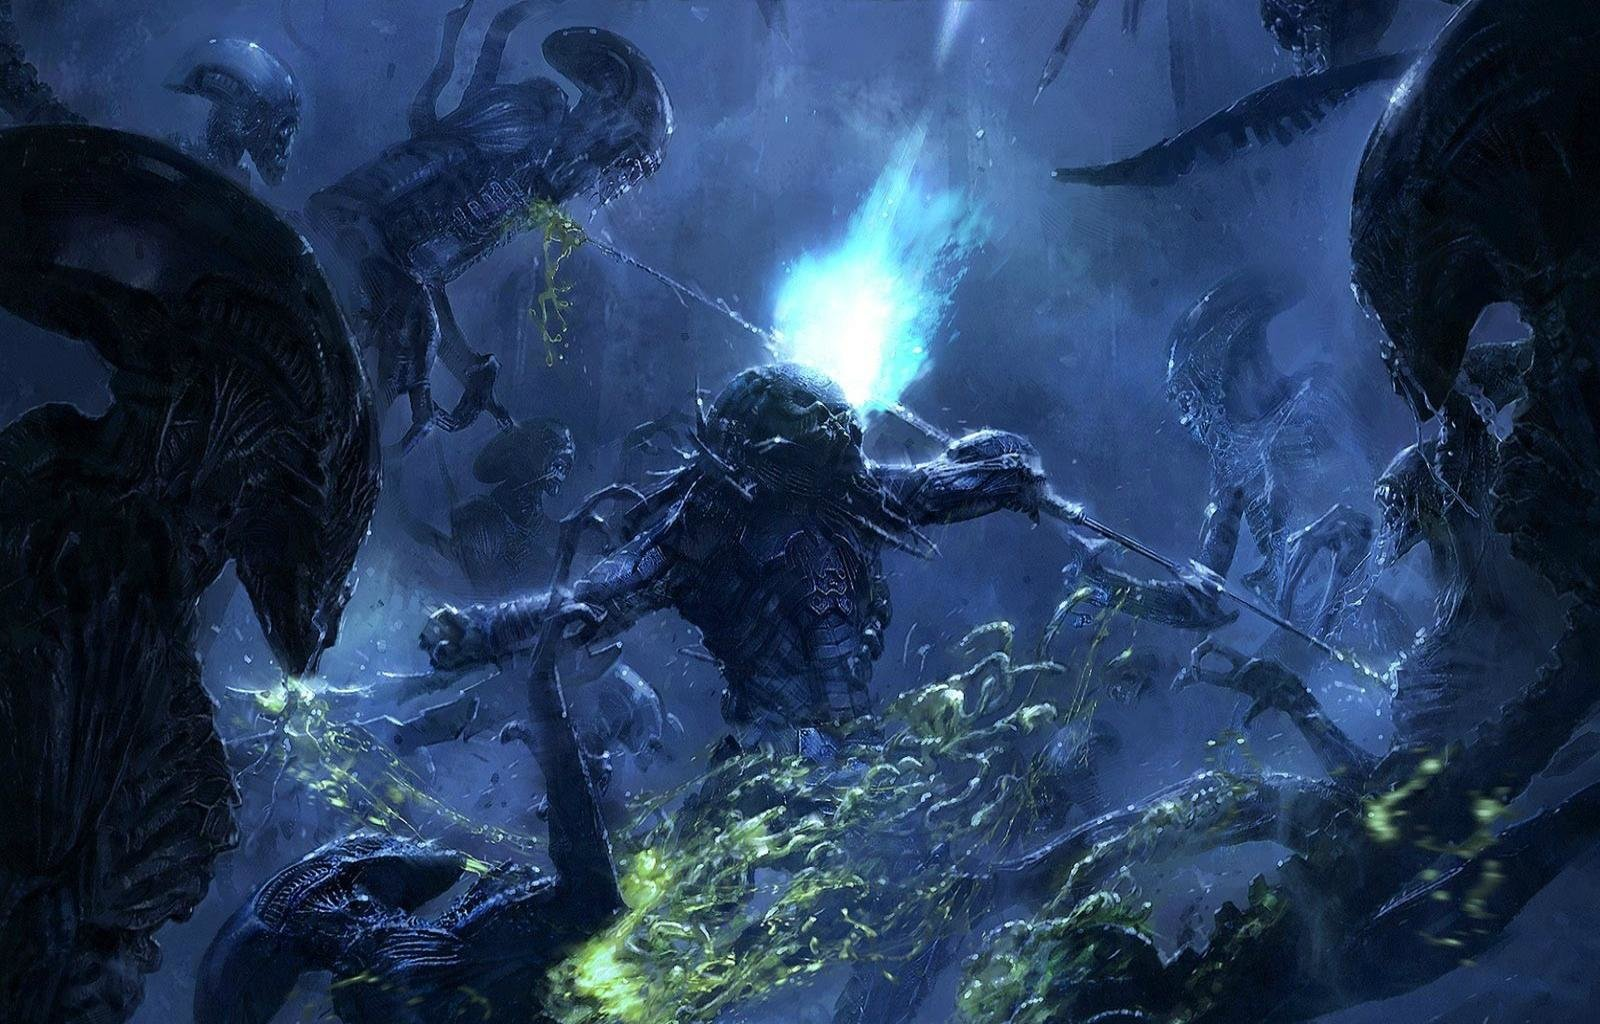 Avp alien vs predator movie wallpapers hd for desktop - Wallpaper 1600x1024 ...